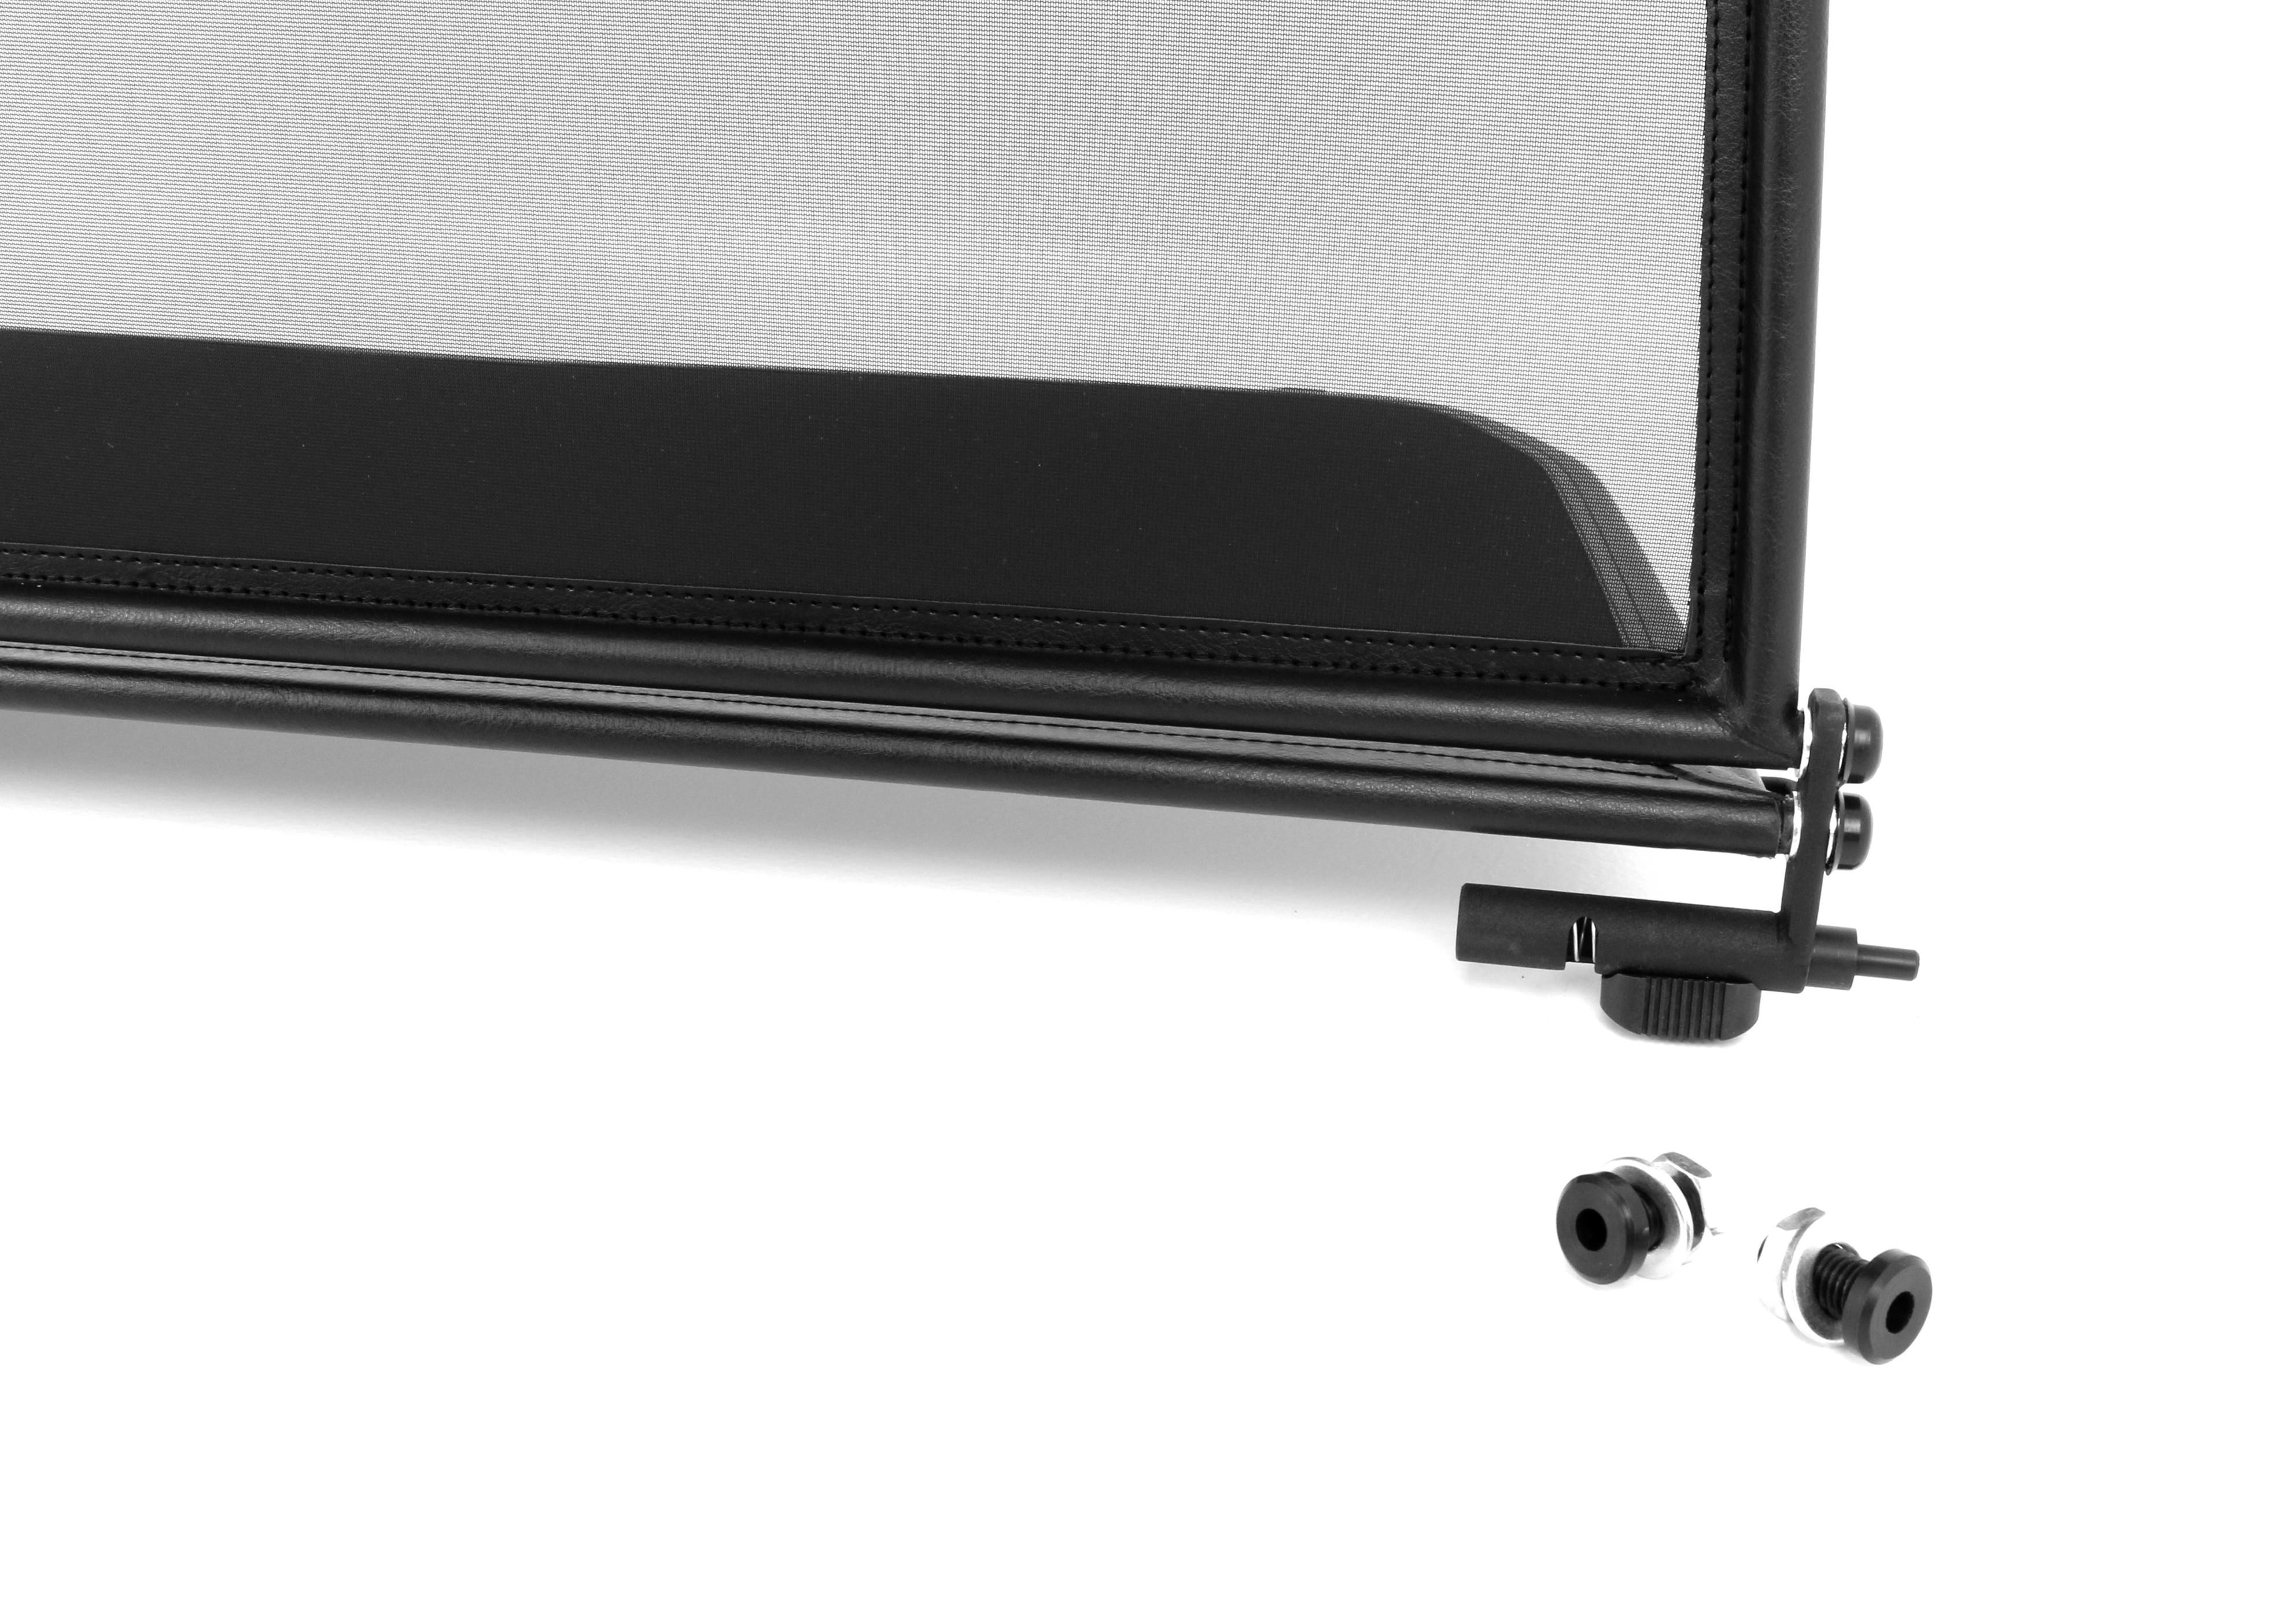 windschott peugeot 306 schwarz neu mit garantie. Black Bedroom Furniture Sets. Home Design Ideas